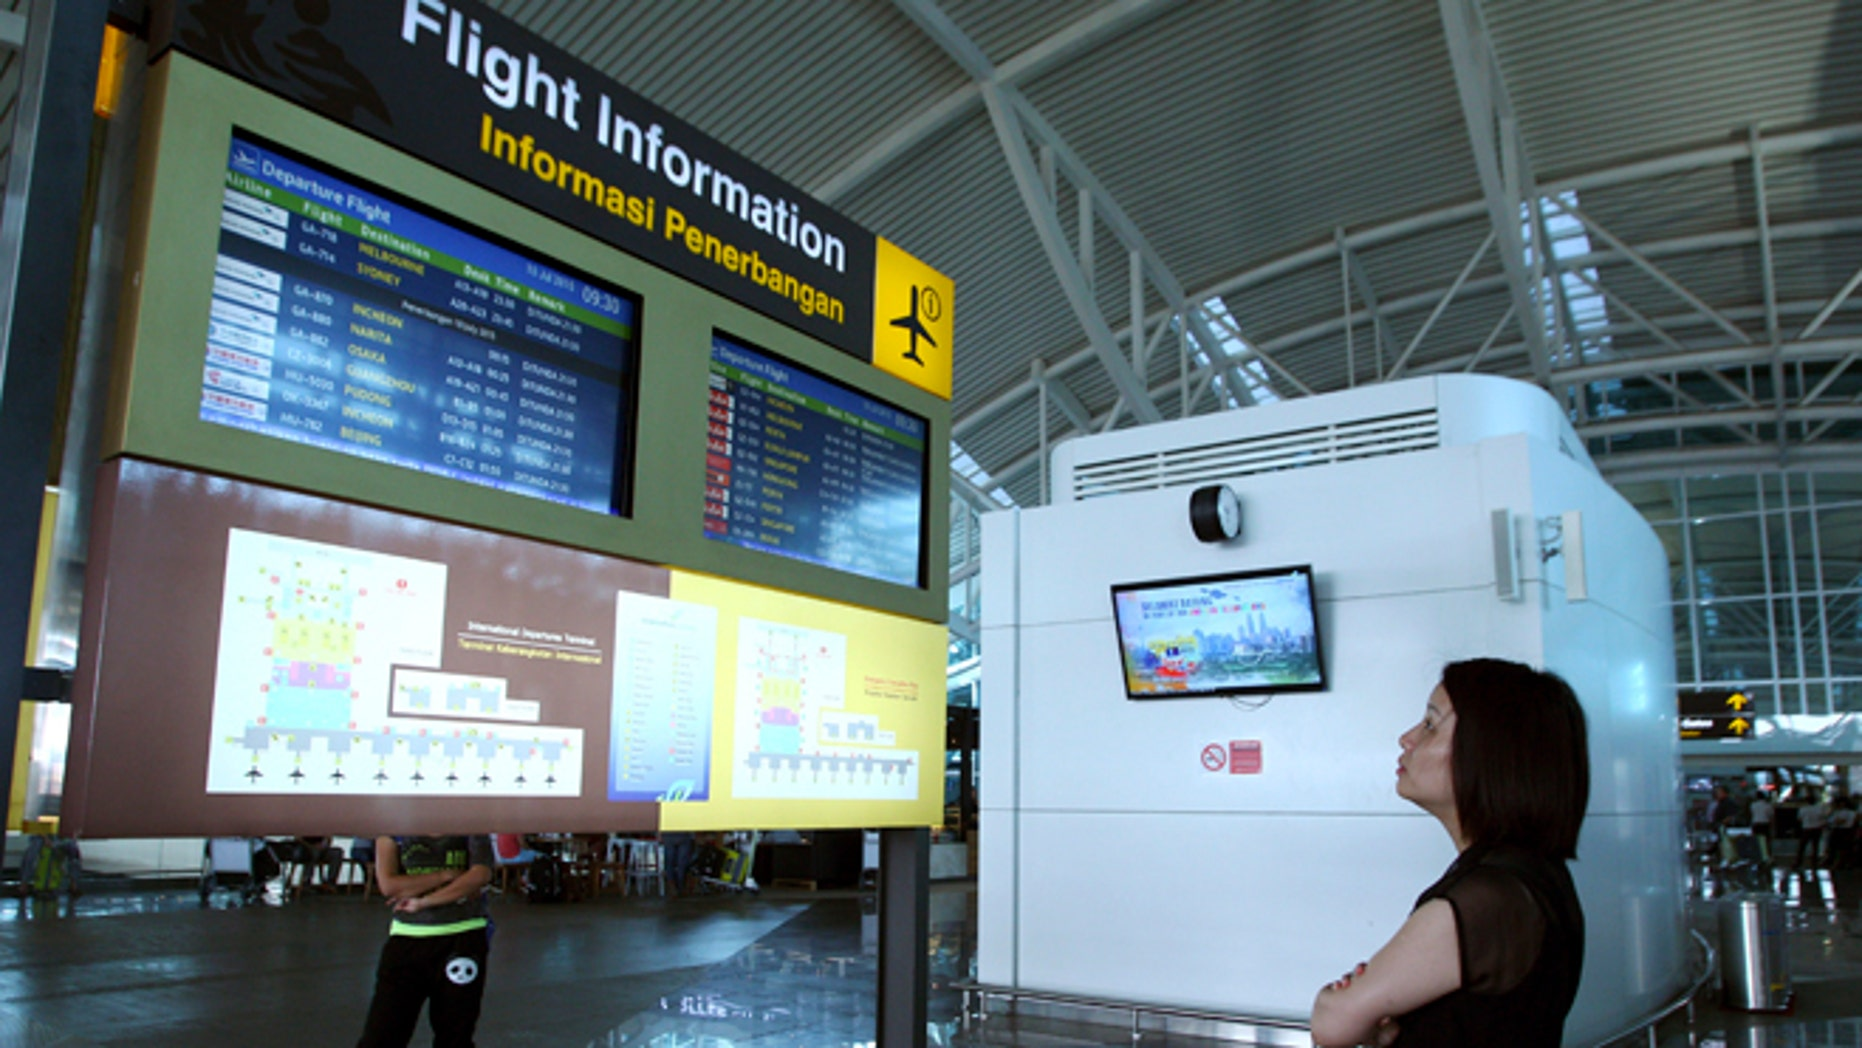 July 10, 2015: A traveler checks the status of flights at Bali's international airport, Indonesia.